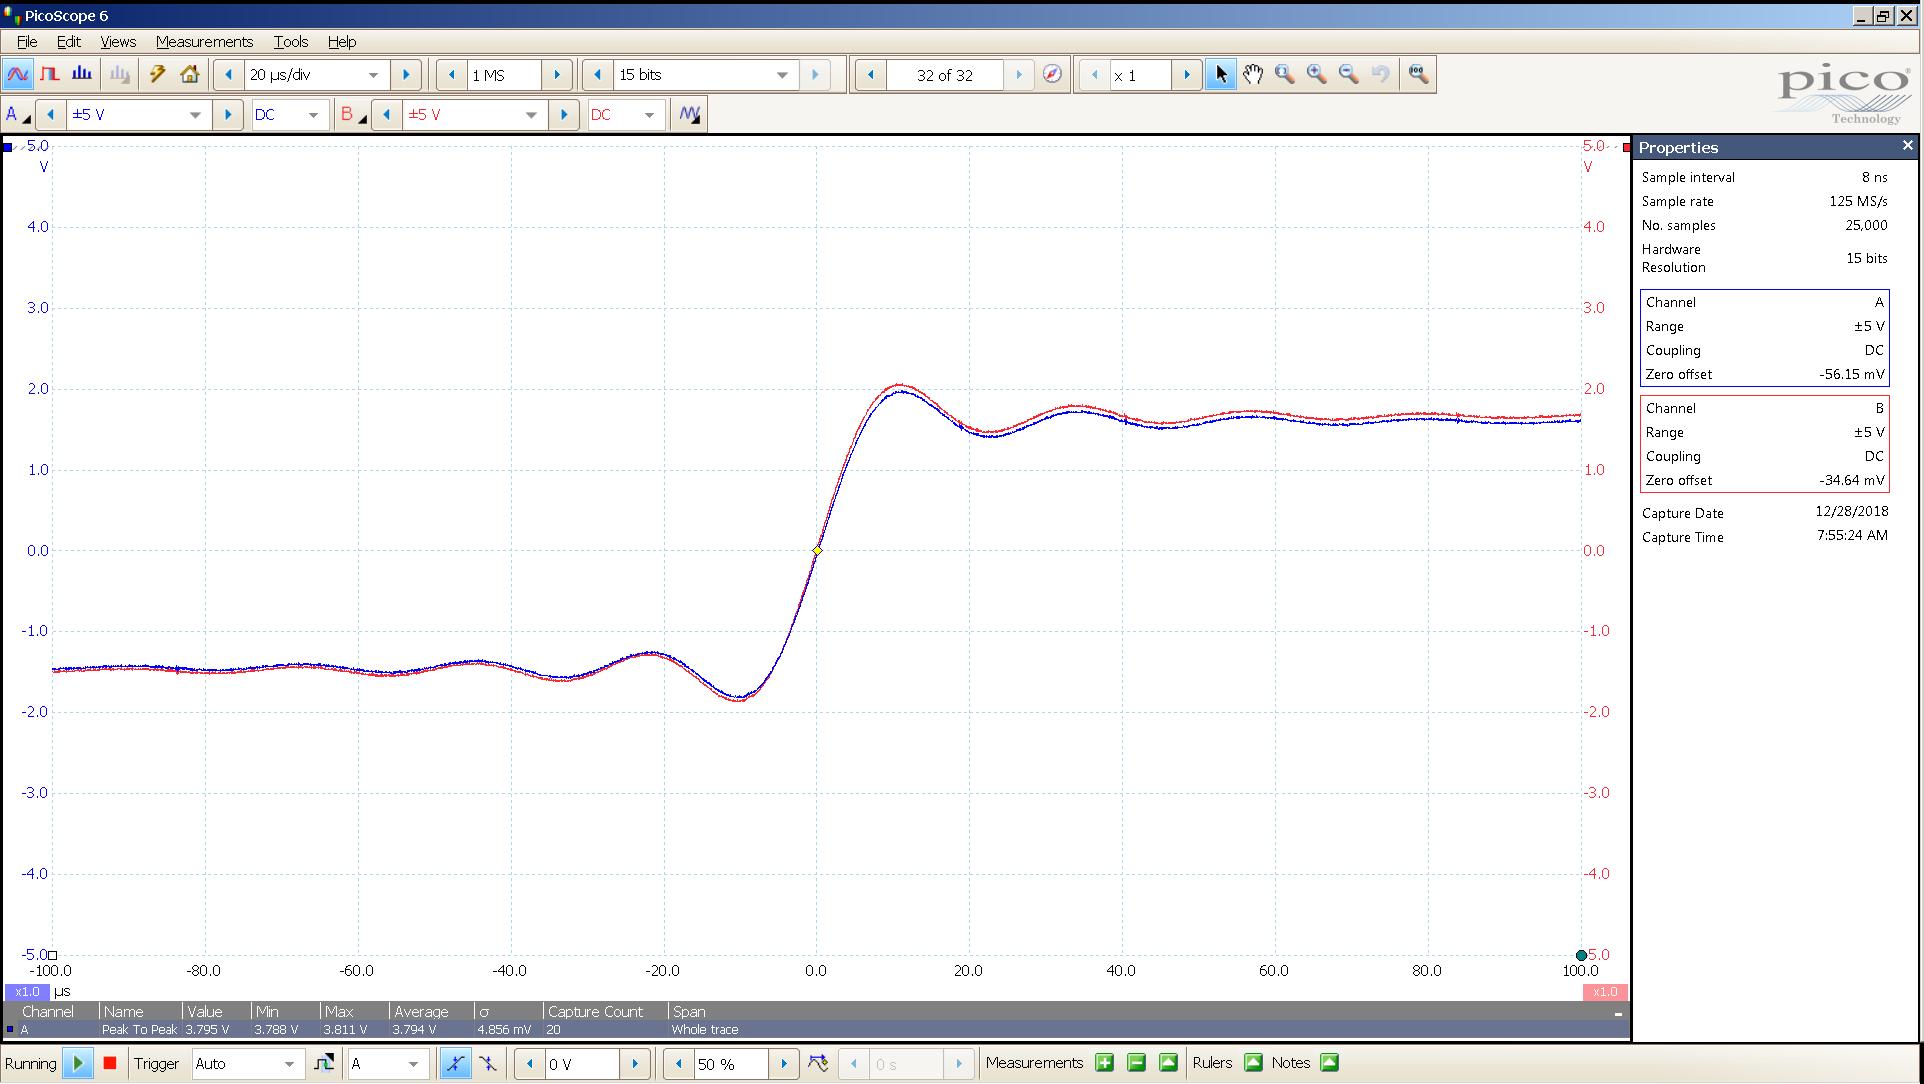 20181227-25 convert2 Bal 20 Hz sqr 0 dBFS 4 Vpp 20uS div - AES 88K.PNG